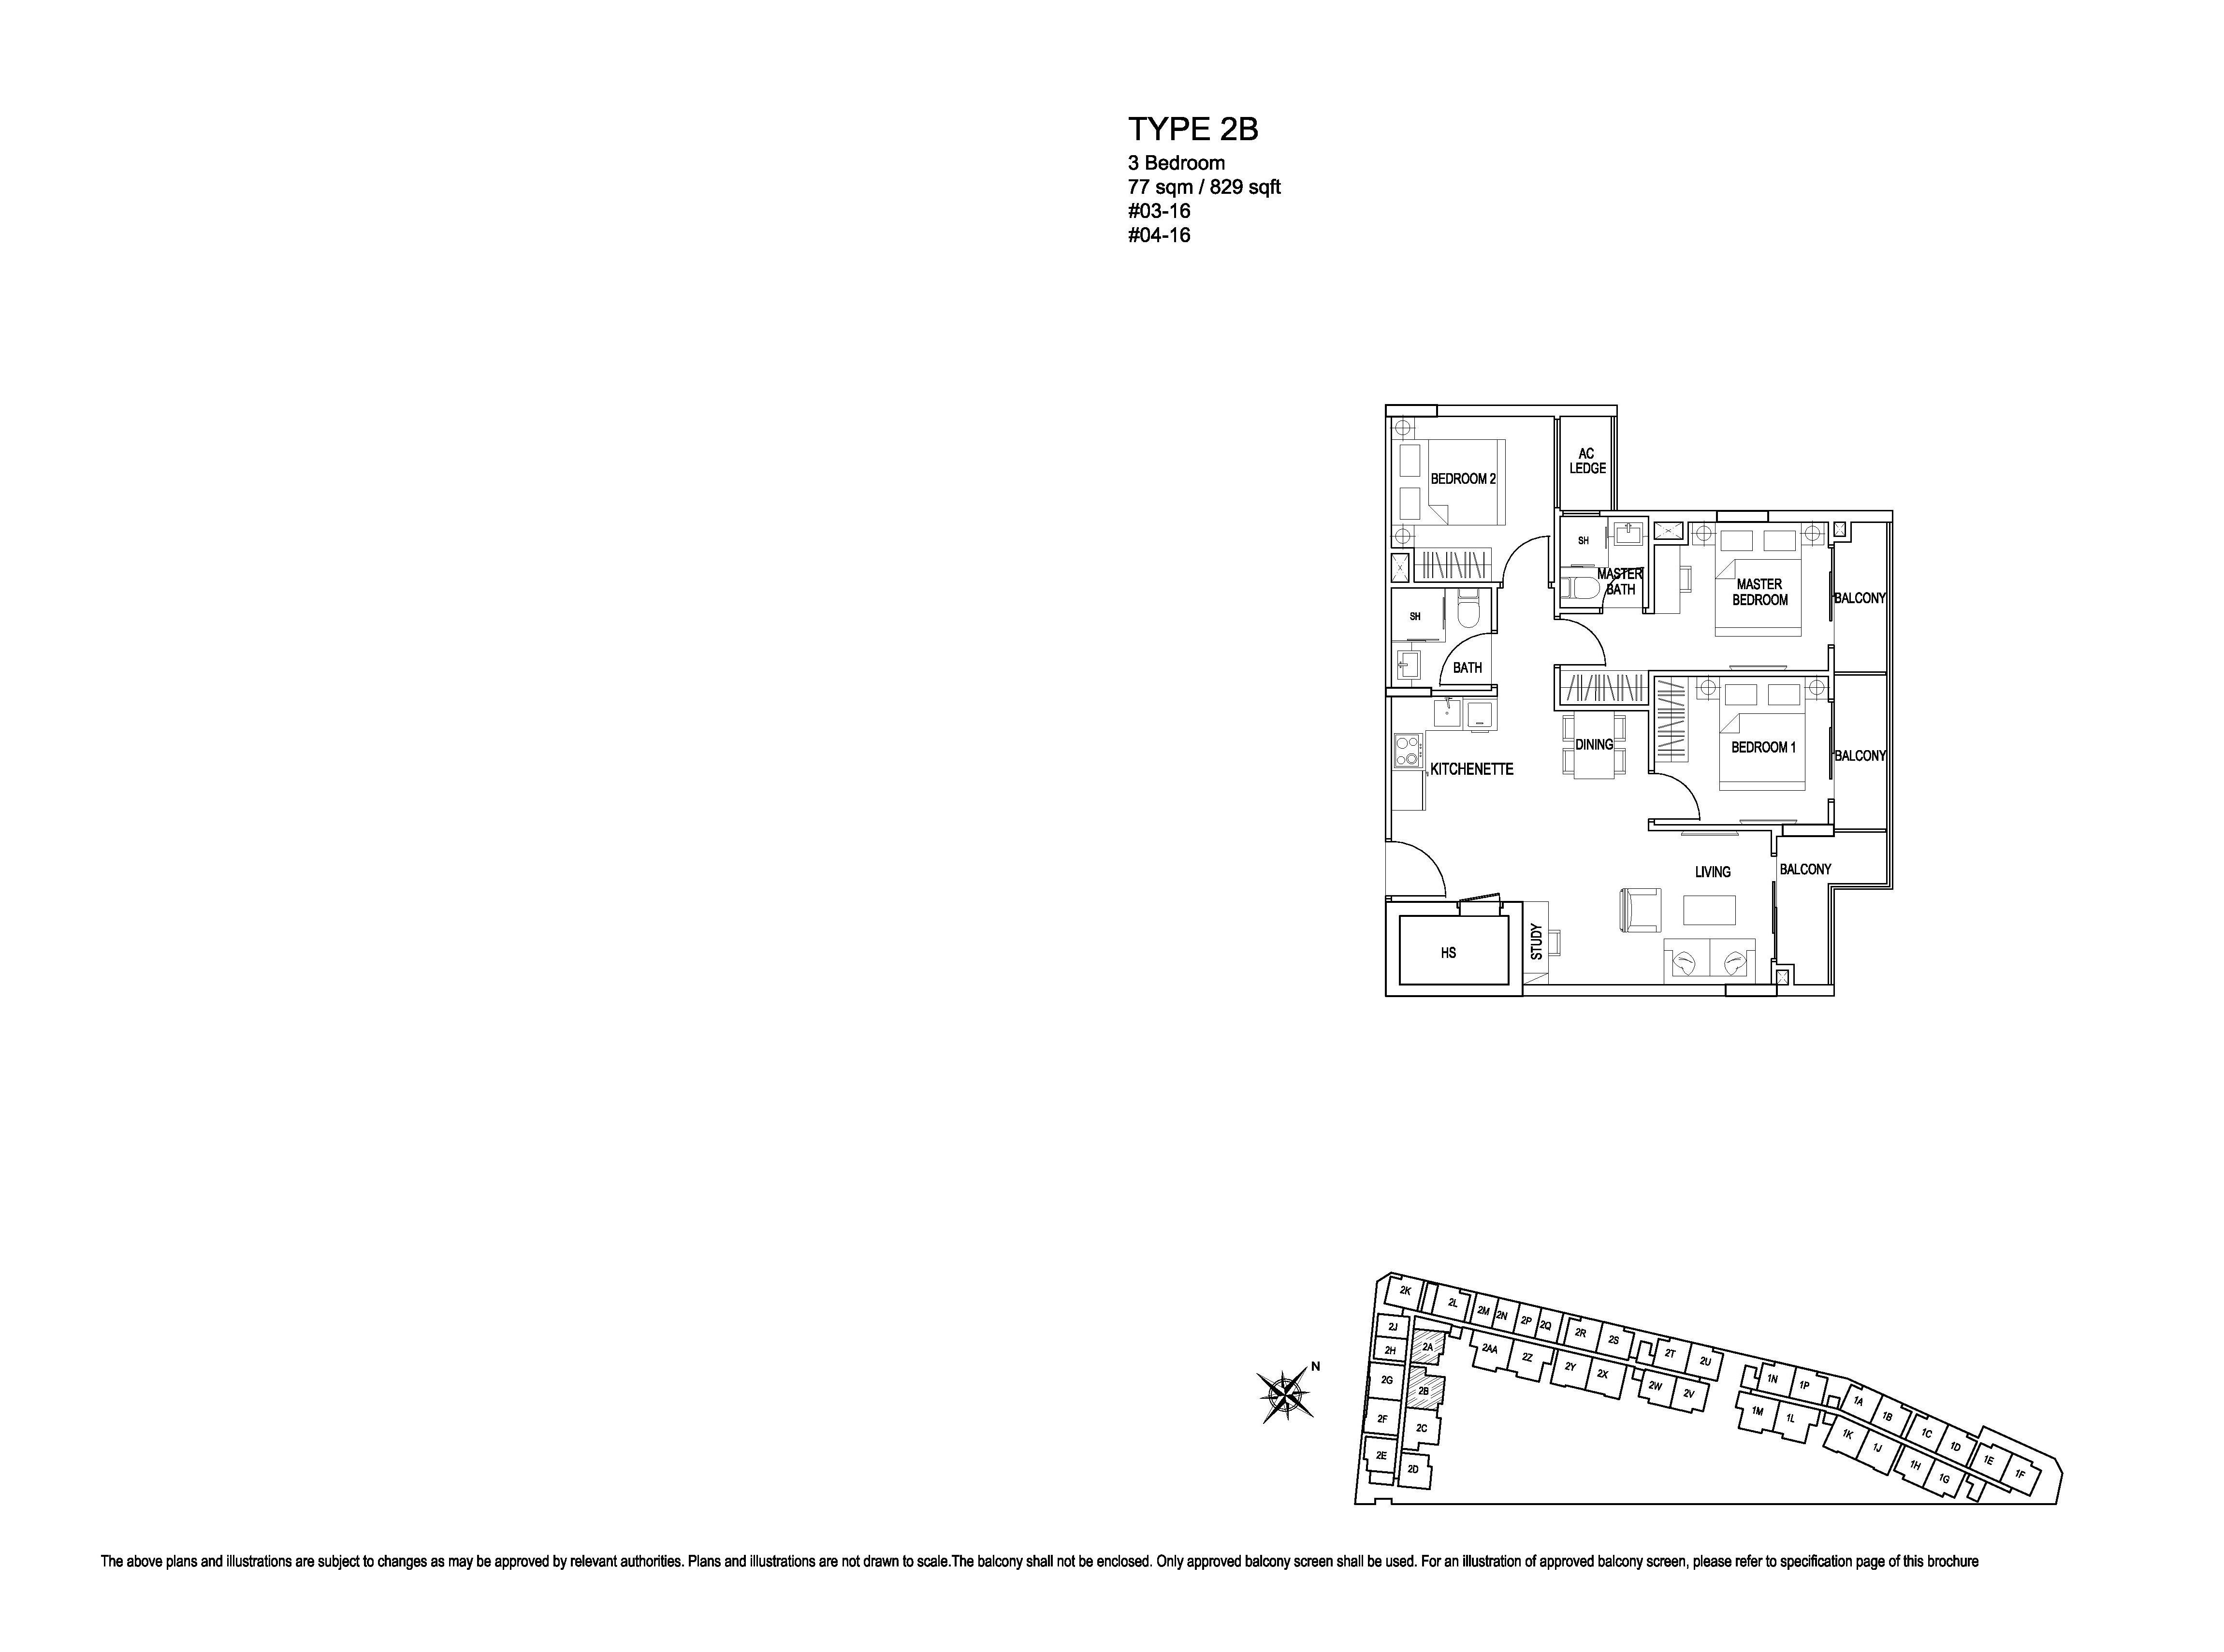 Kensington Square 3 Bedroom Floor Plans Type Type 2B